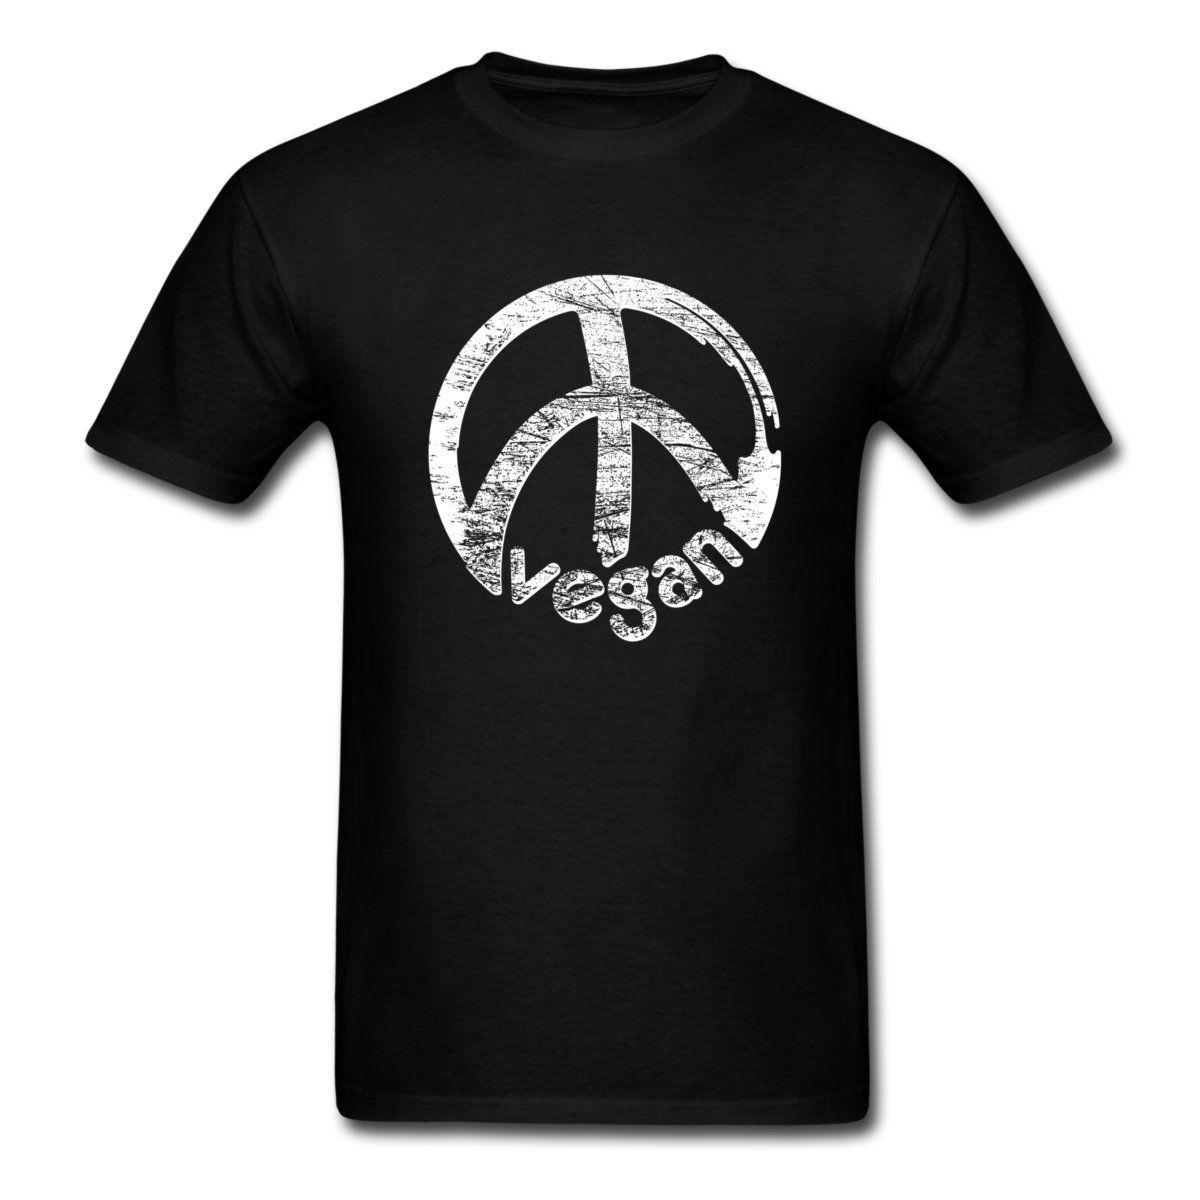 T Shirt Shop Online  Crew Neck Men Short Sleeve Best Friend Formal Veganism Vegan Peace Shirts